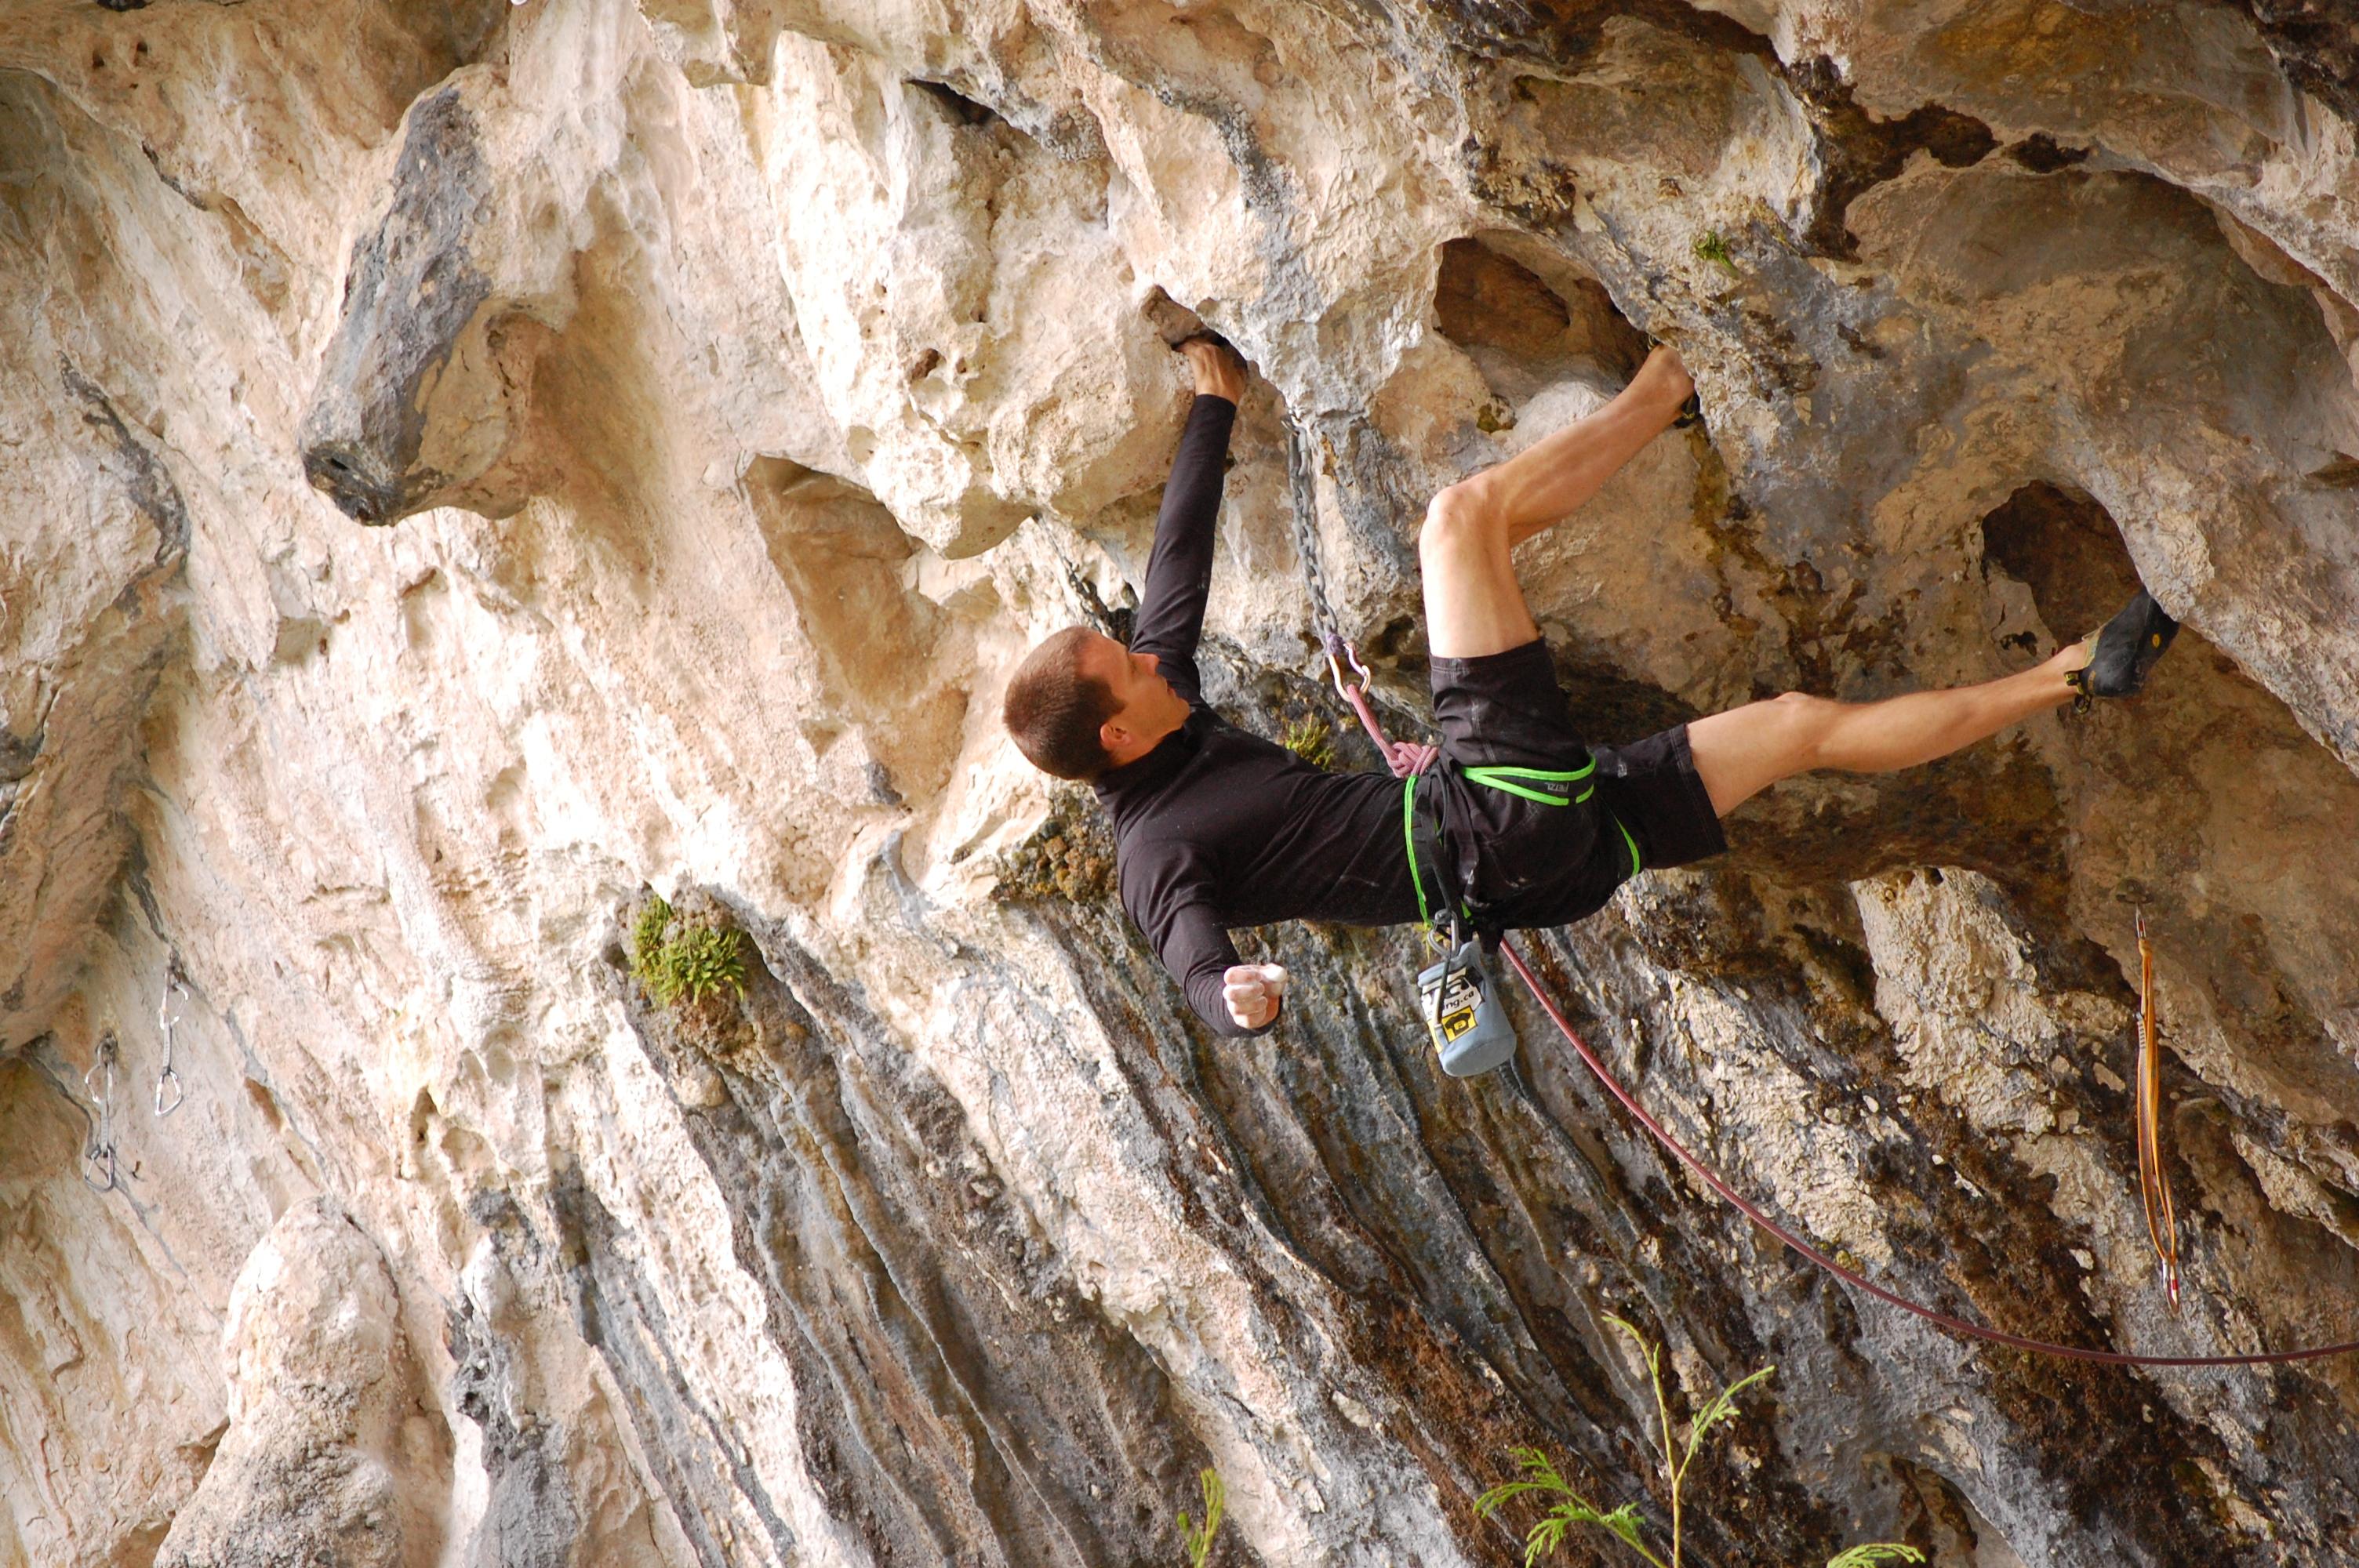 Source: https://commons.wikimedia.org/wiki/File:Overhanging_rock_climbing.jpg